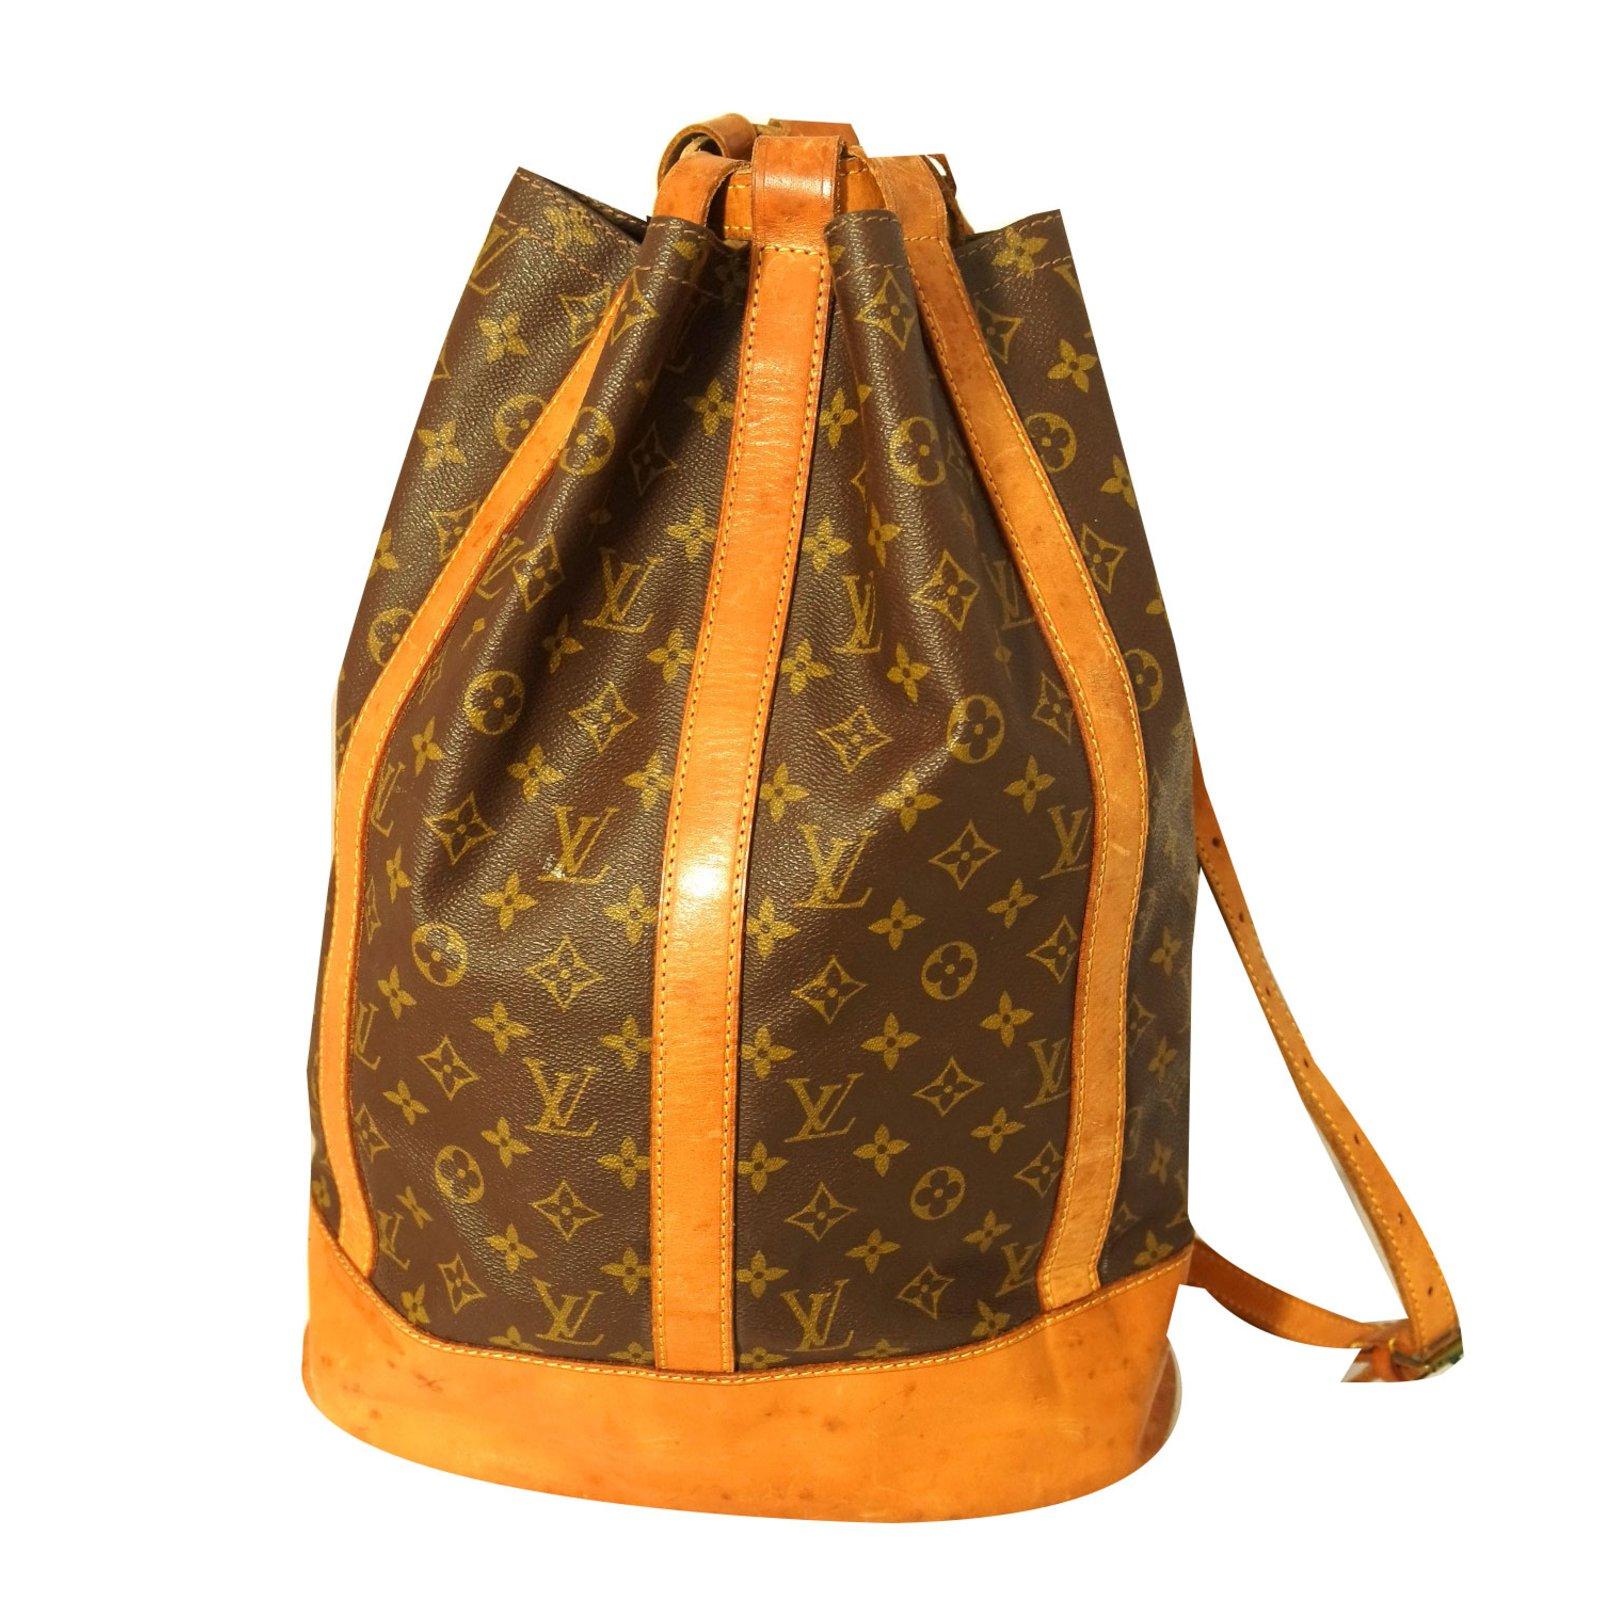 Sacs de voyage Louis Vuitton Sac